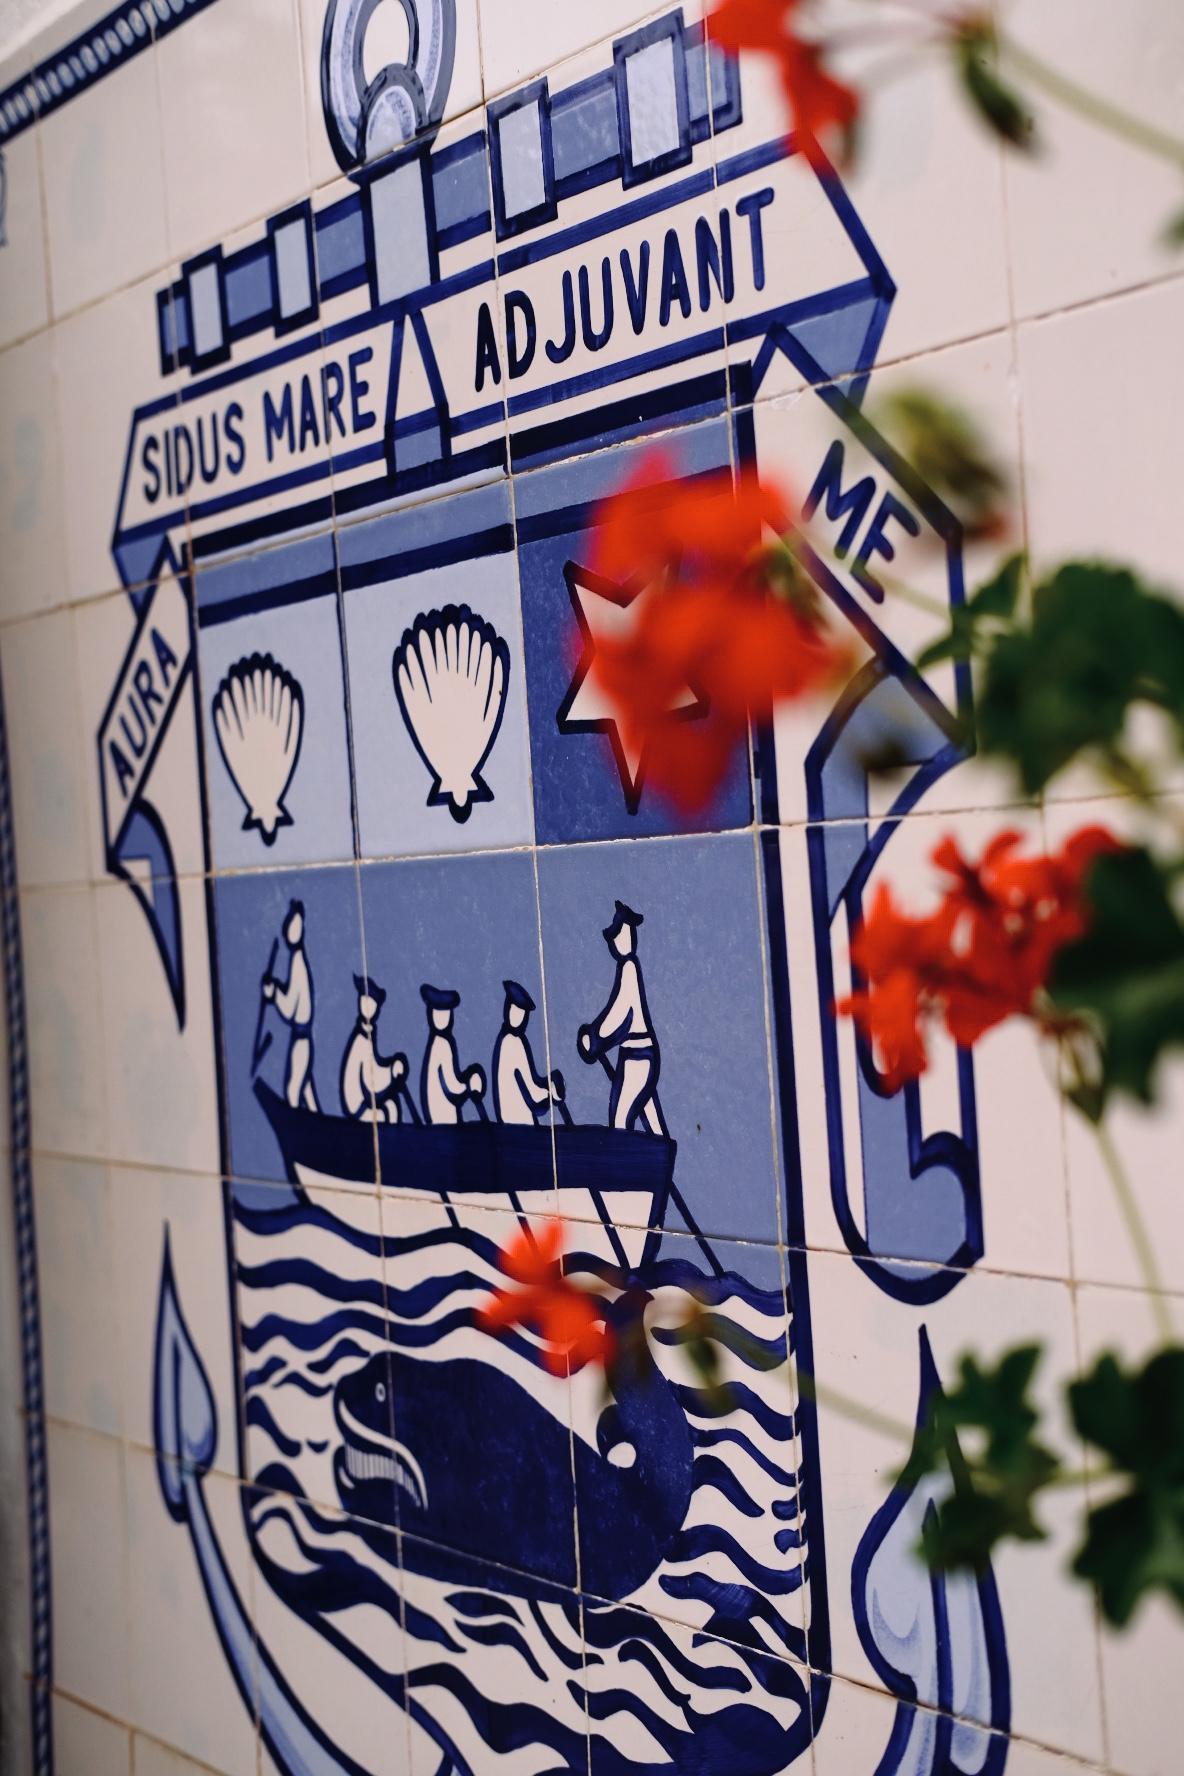 biarritz coat of arms